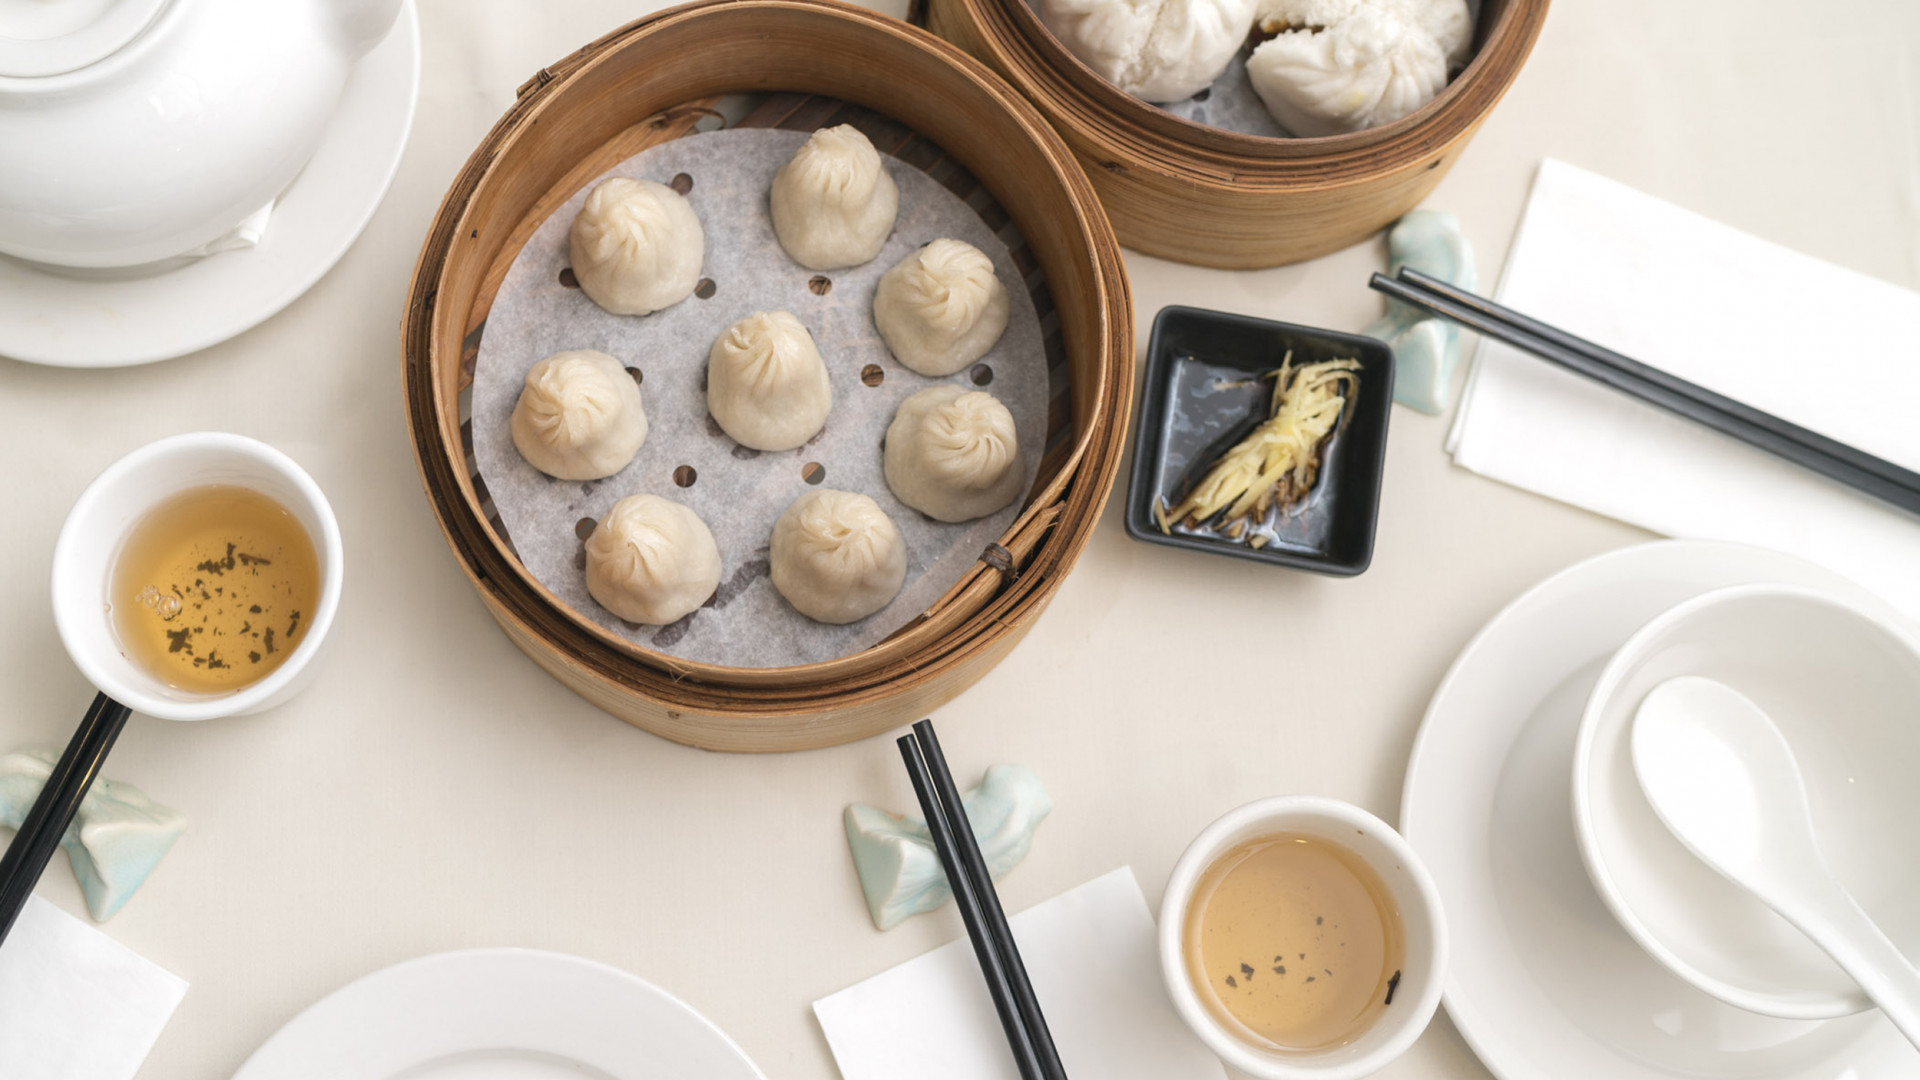 Dumplings Legend, Chinatown